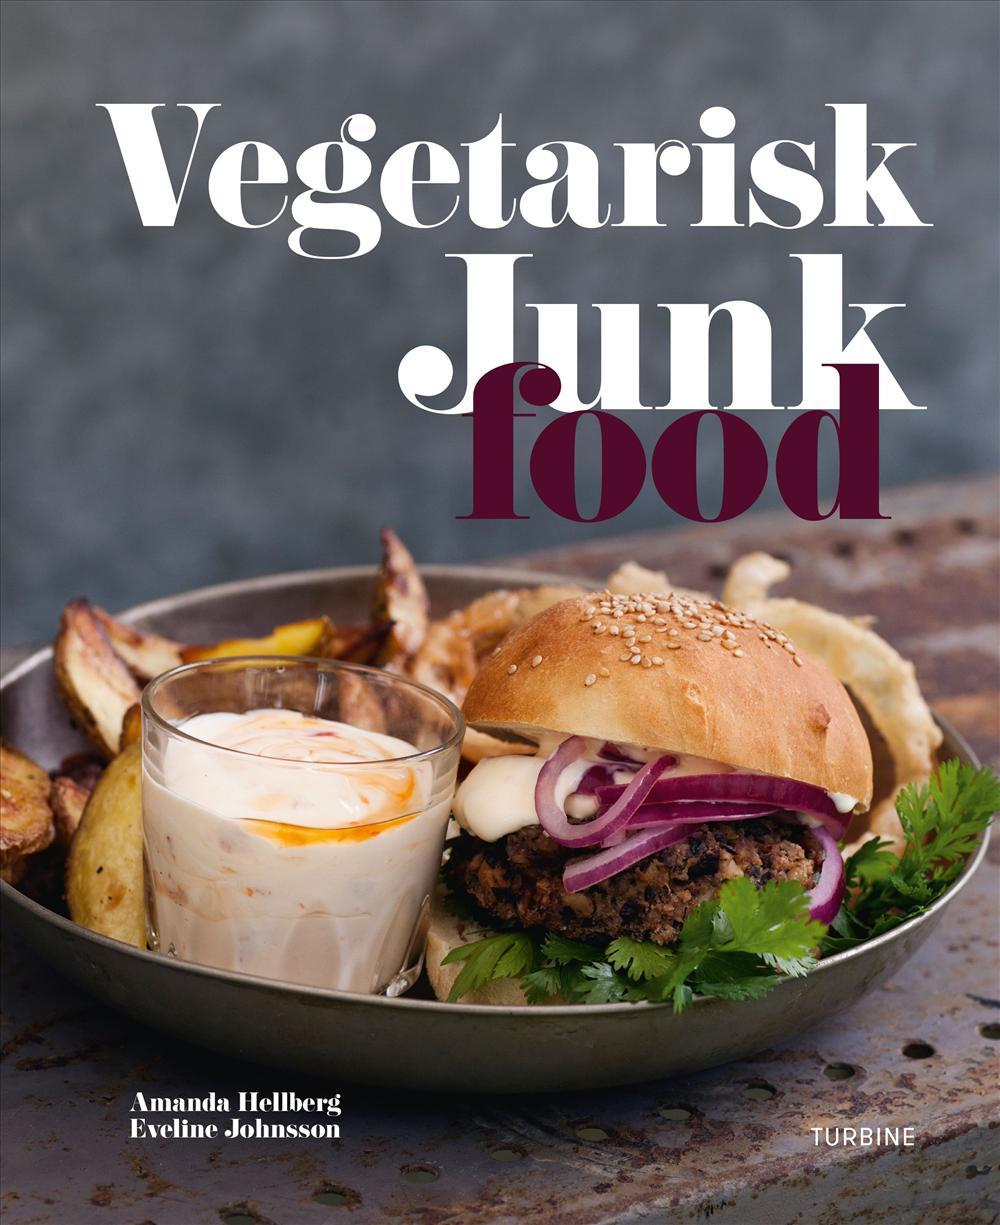 Vegetarisk junkfood